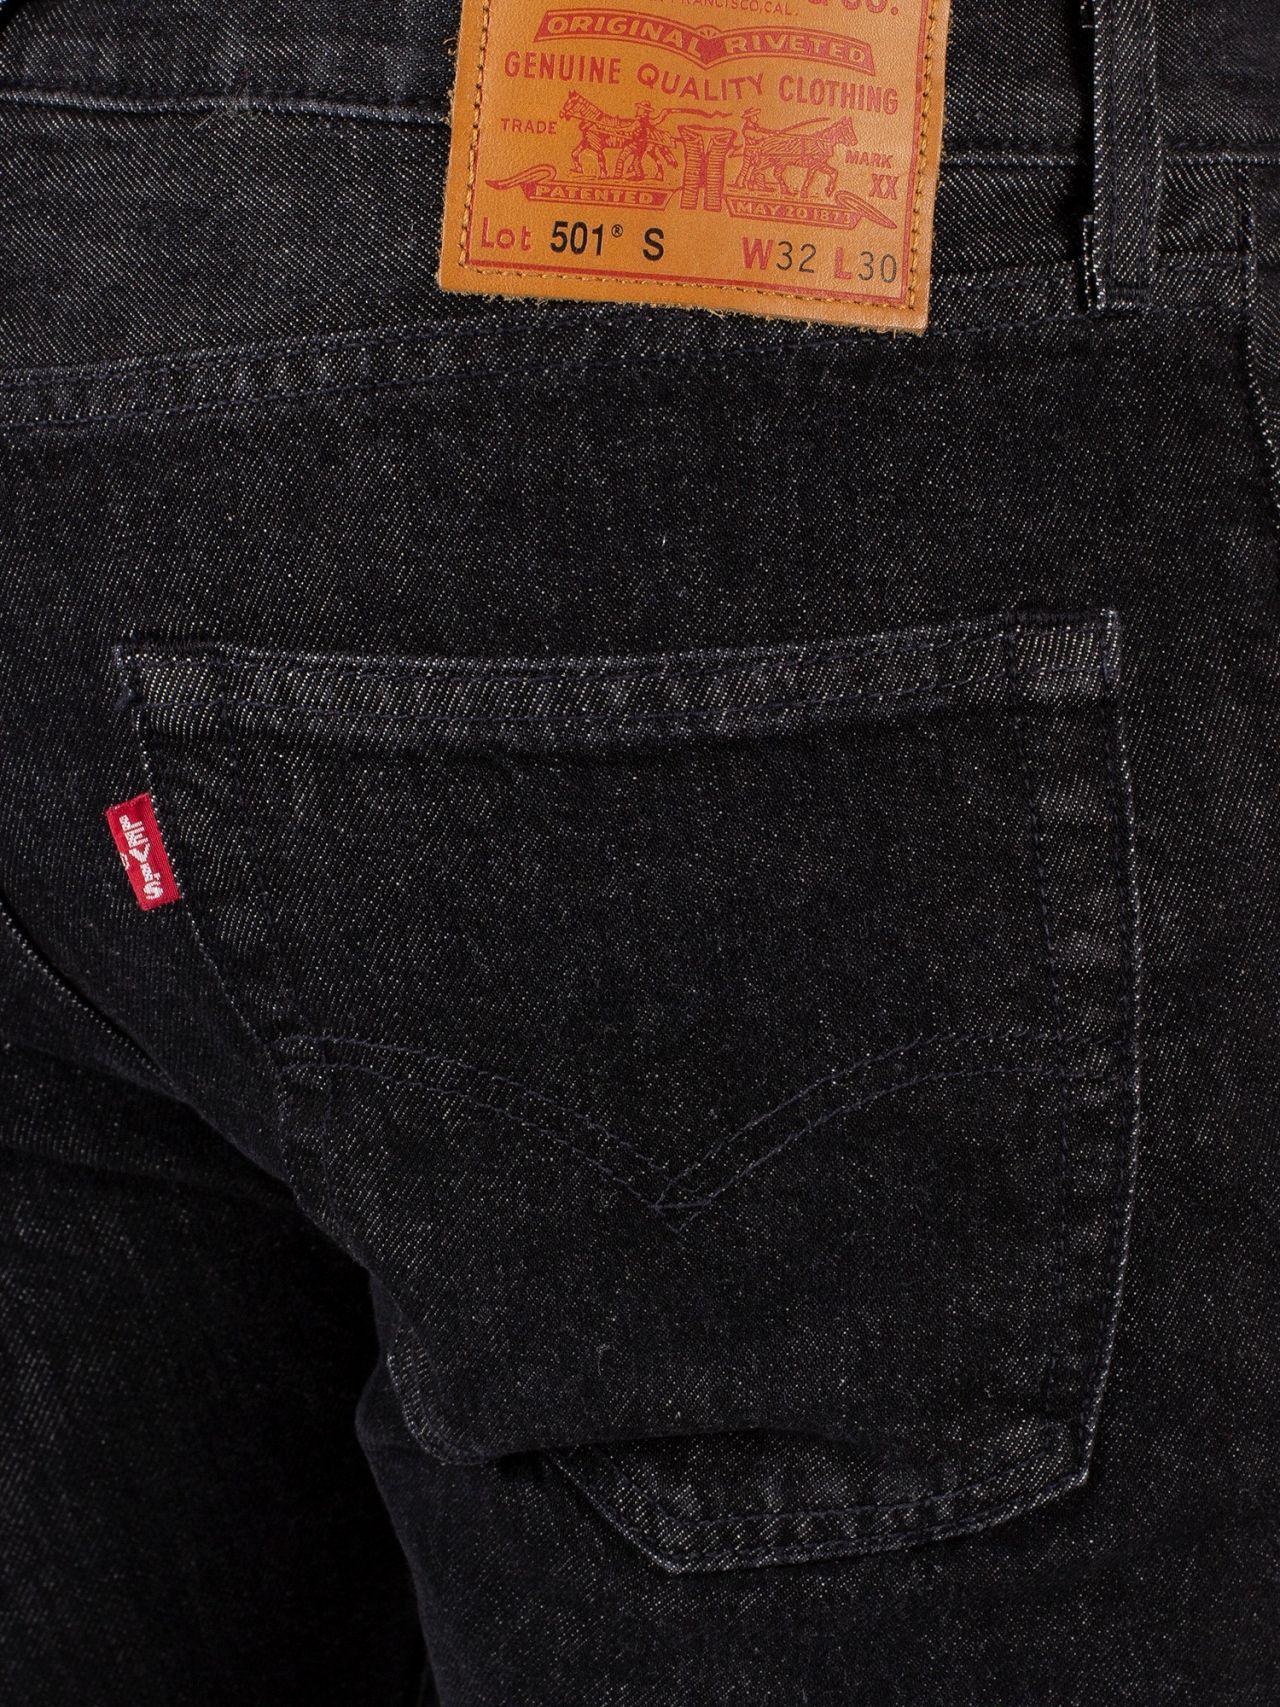 Warp Lyst 501 In Skinny Levi's Men For Jeans Black URSz7